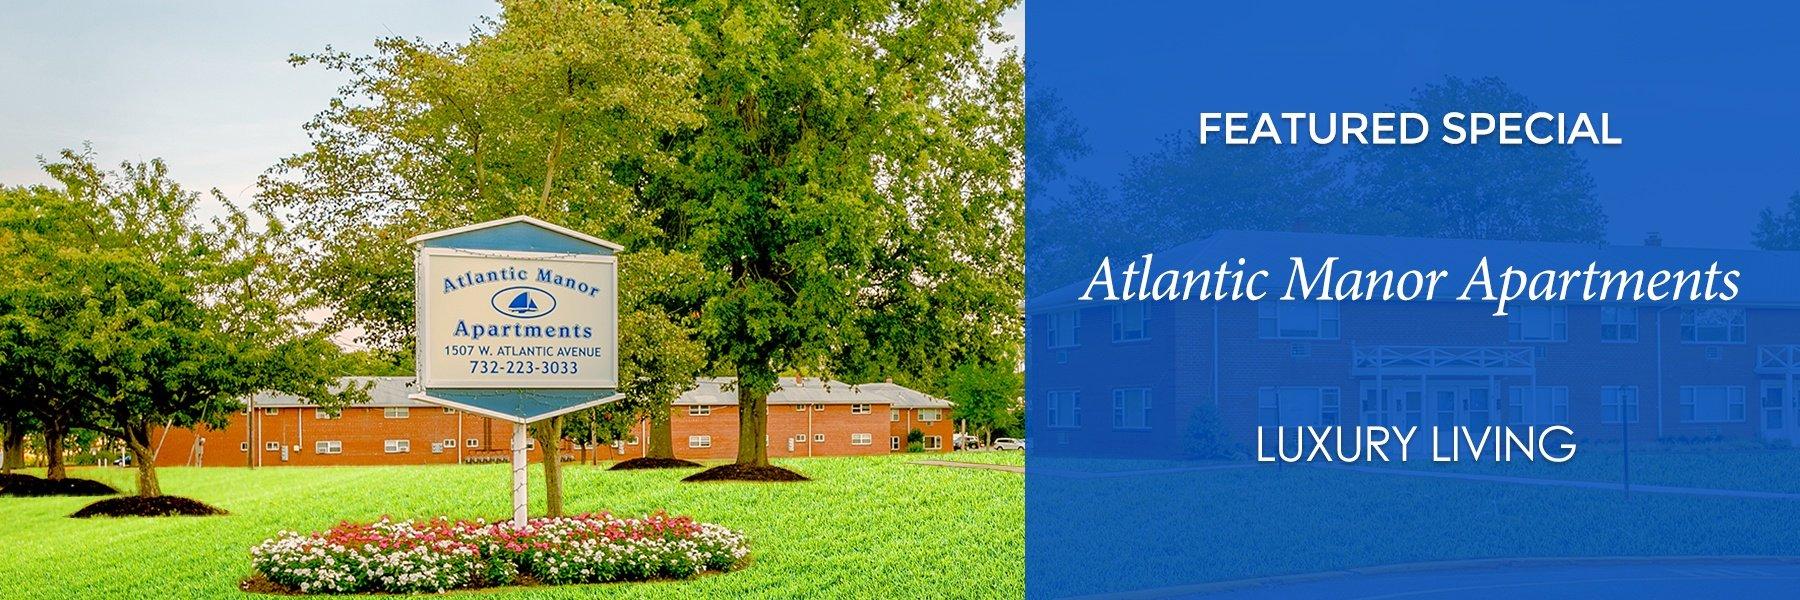 Atlantic Manor Apartments for Rent in Manasquan, NJ Specials